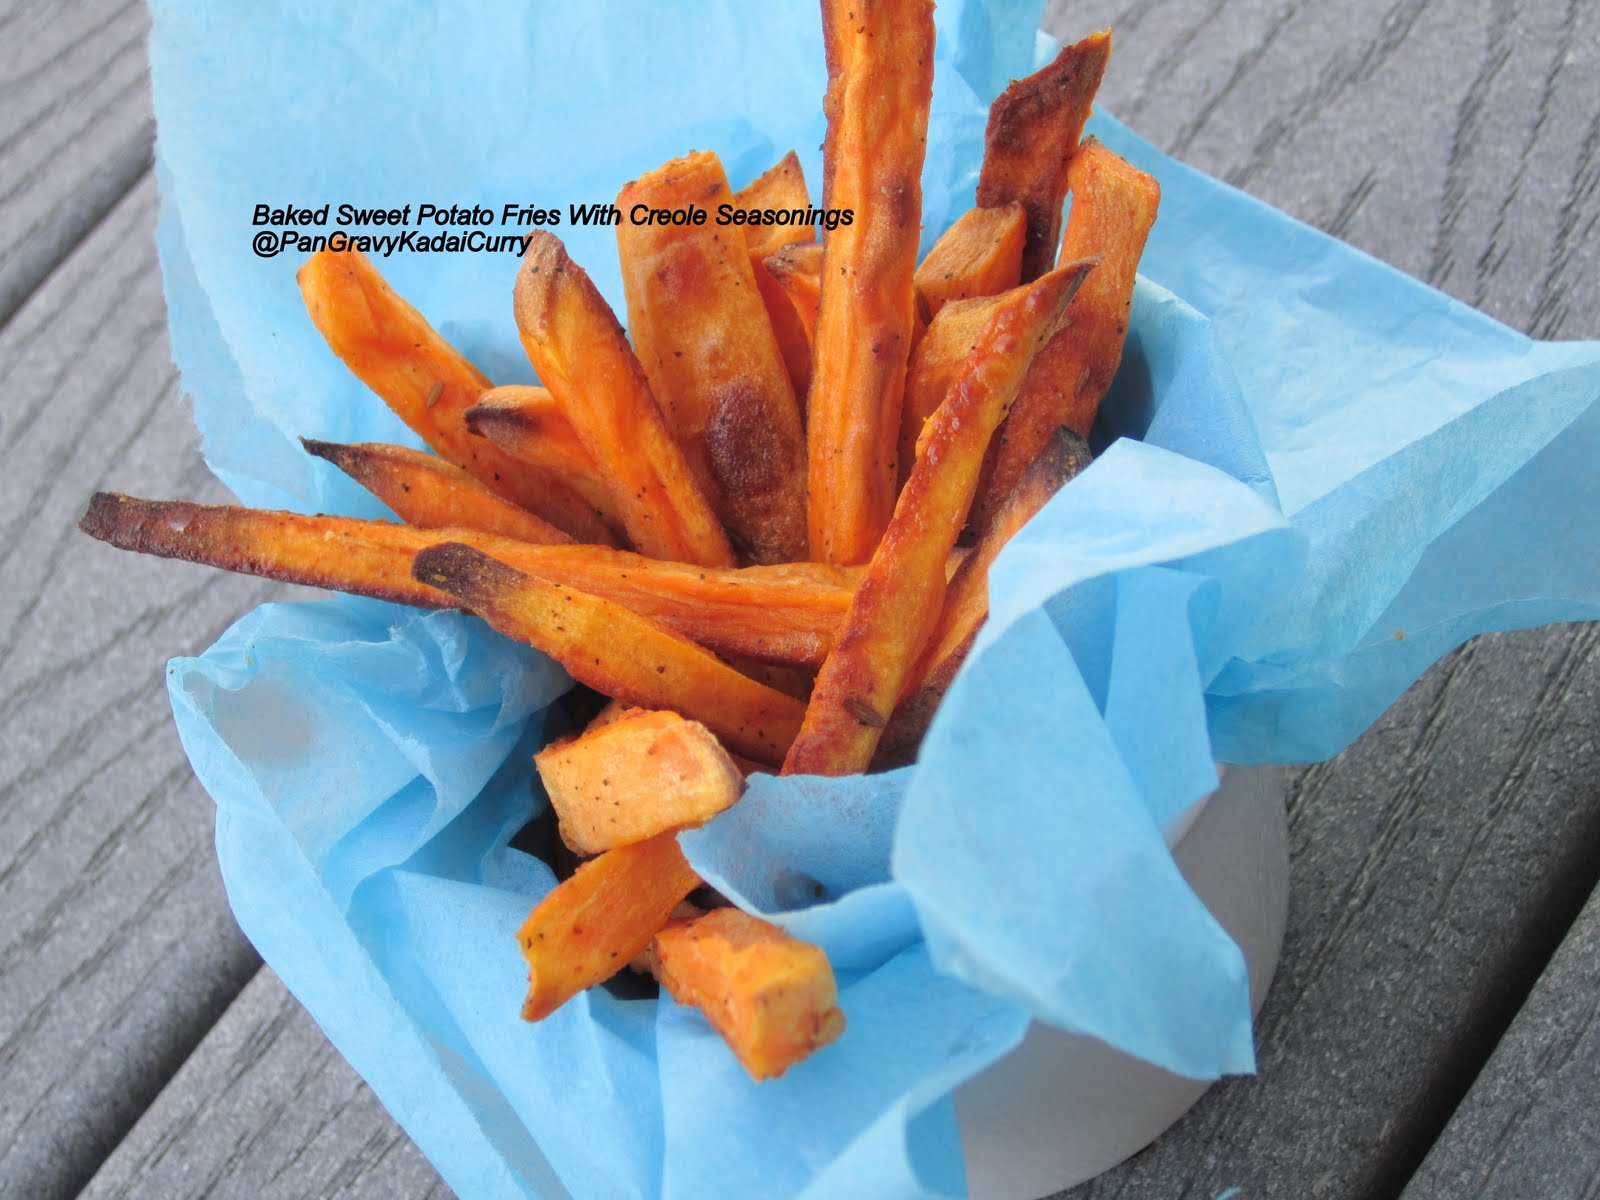 Pan Gravy Kadai Curry: Baked Sweet Potato Fries With Creole Seasonings